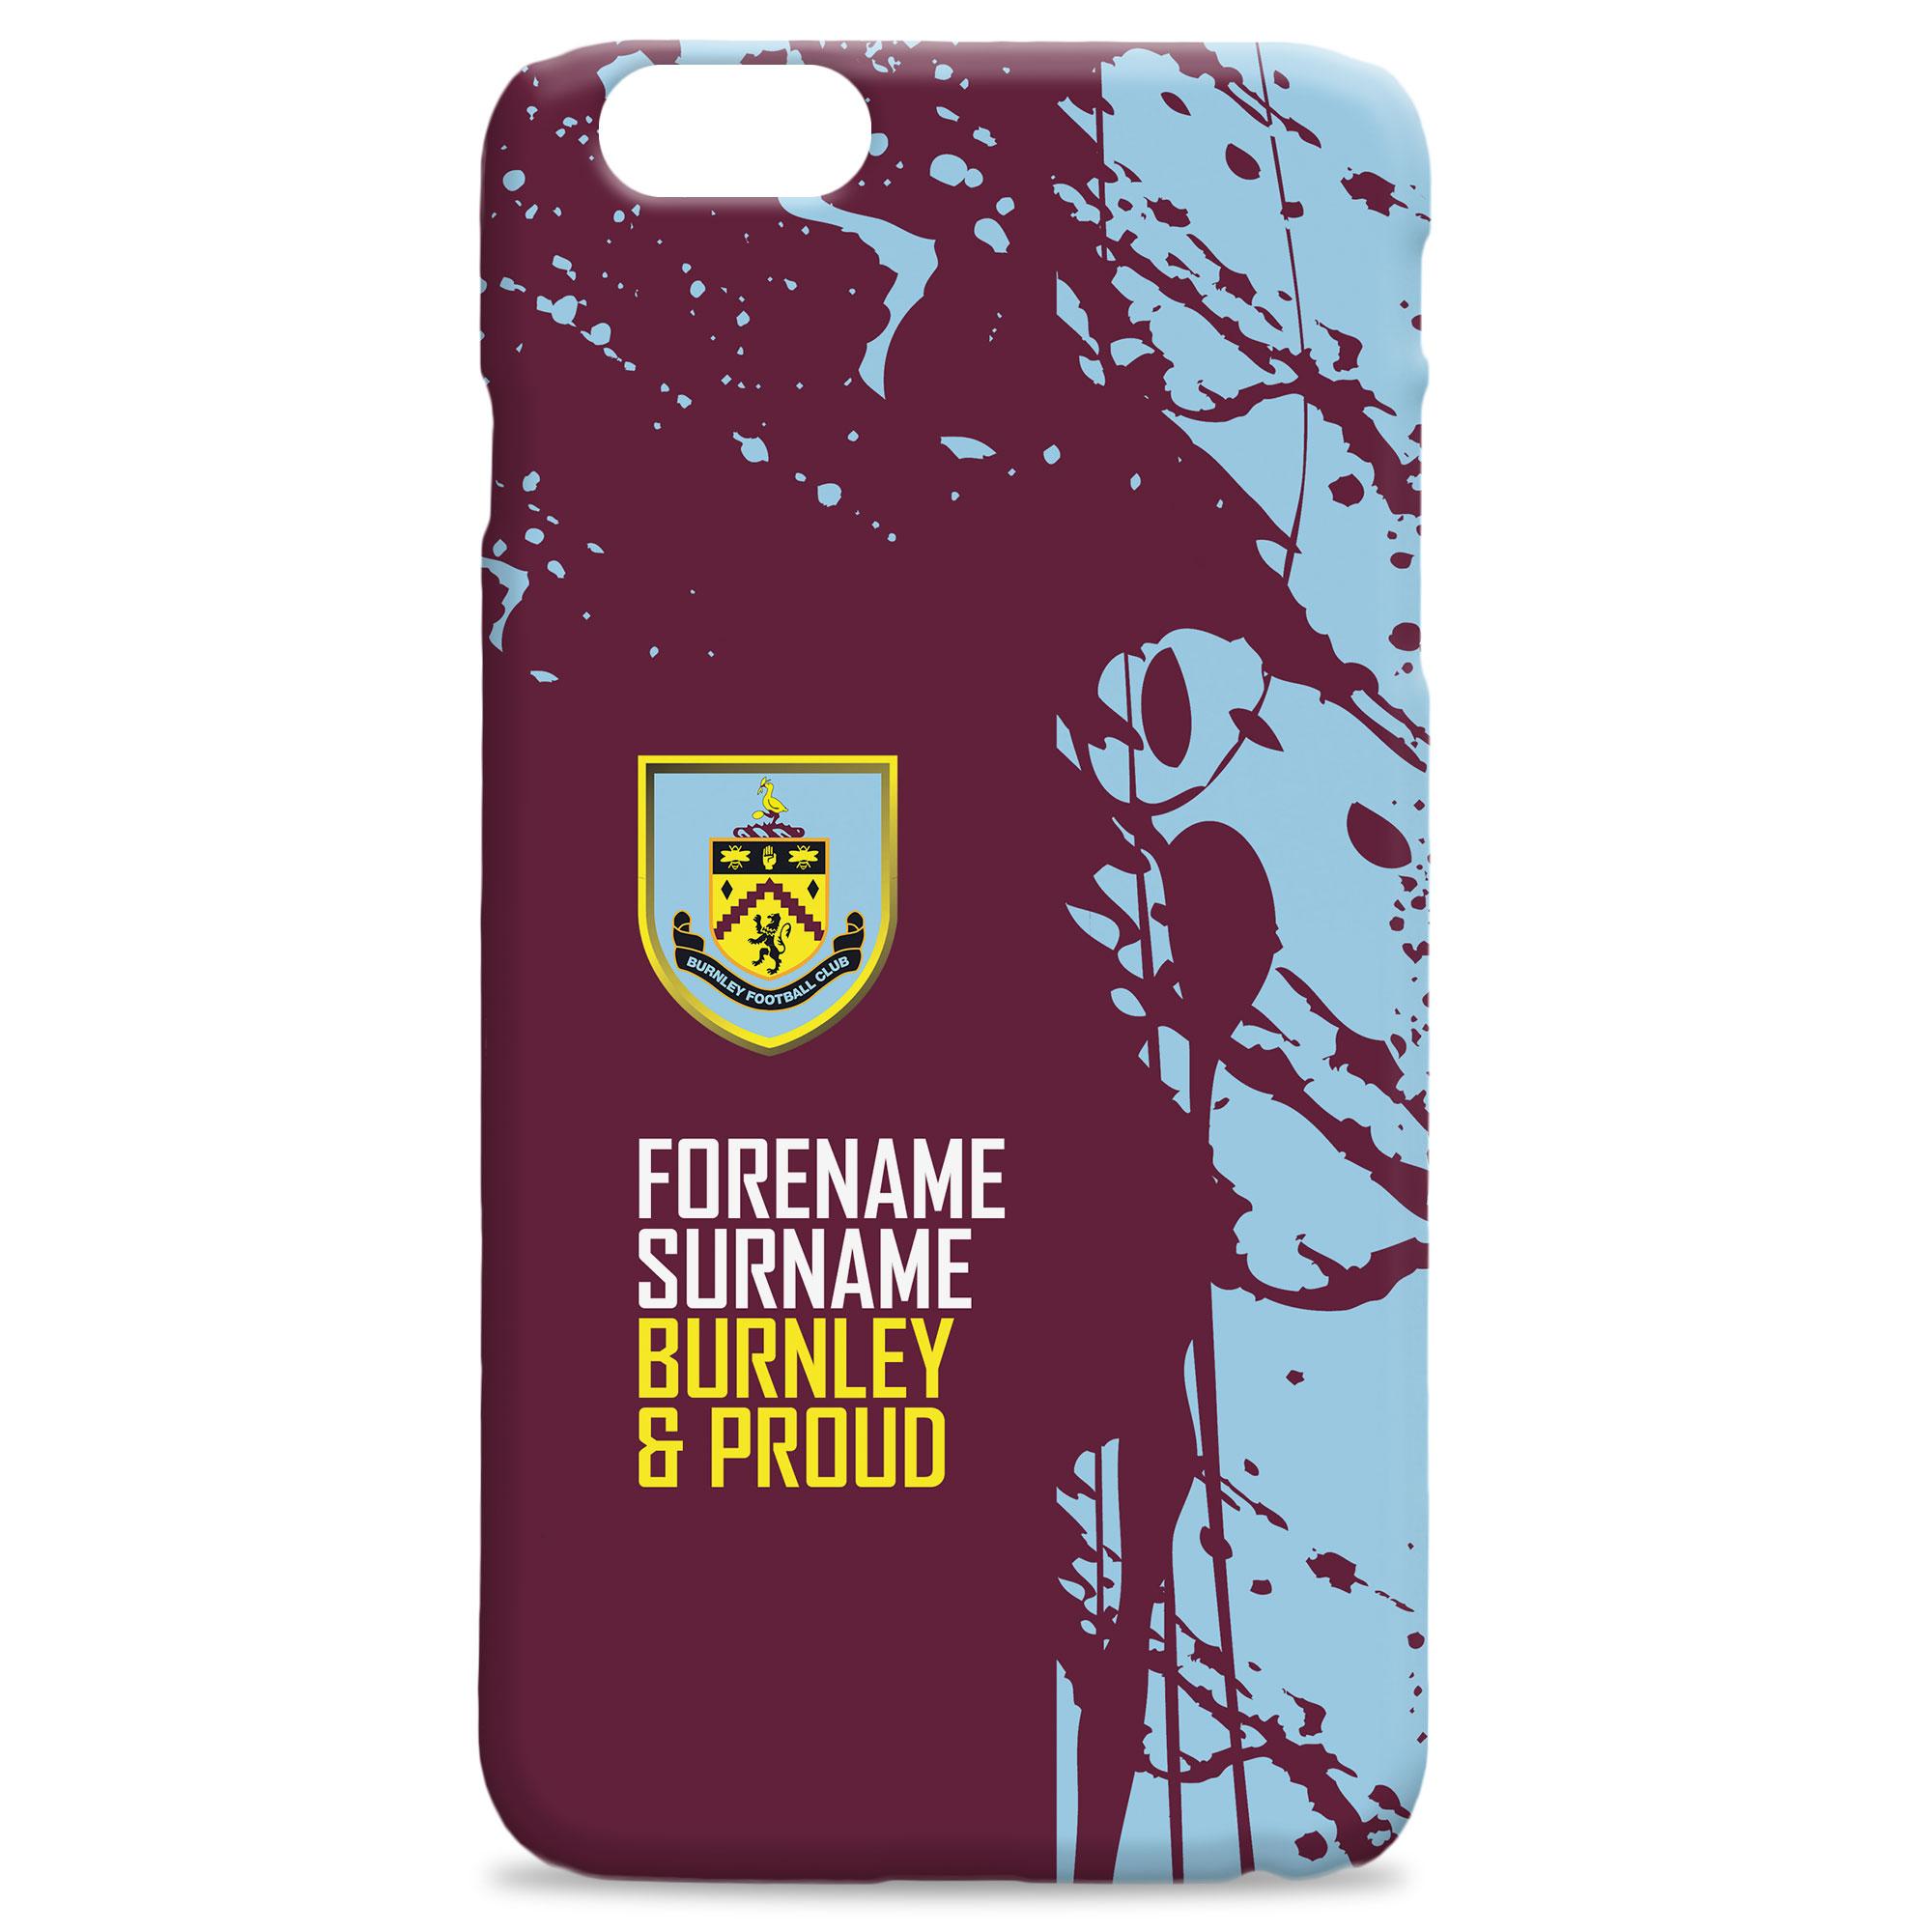 Burnley FC Proud Hard Back Phone Case